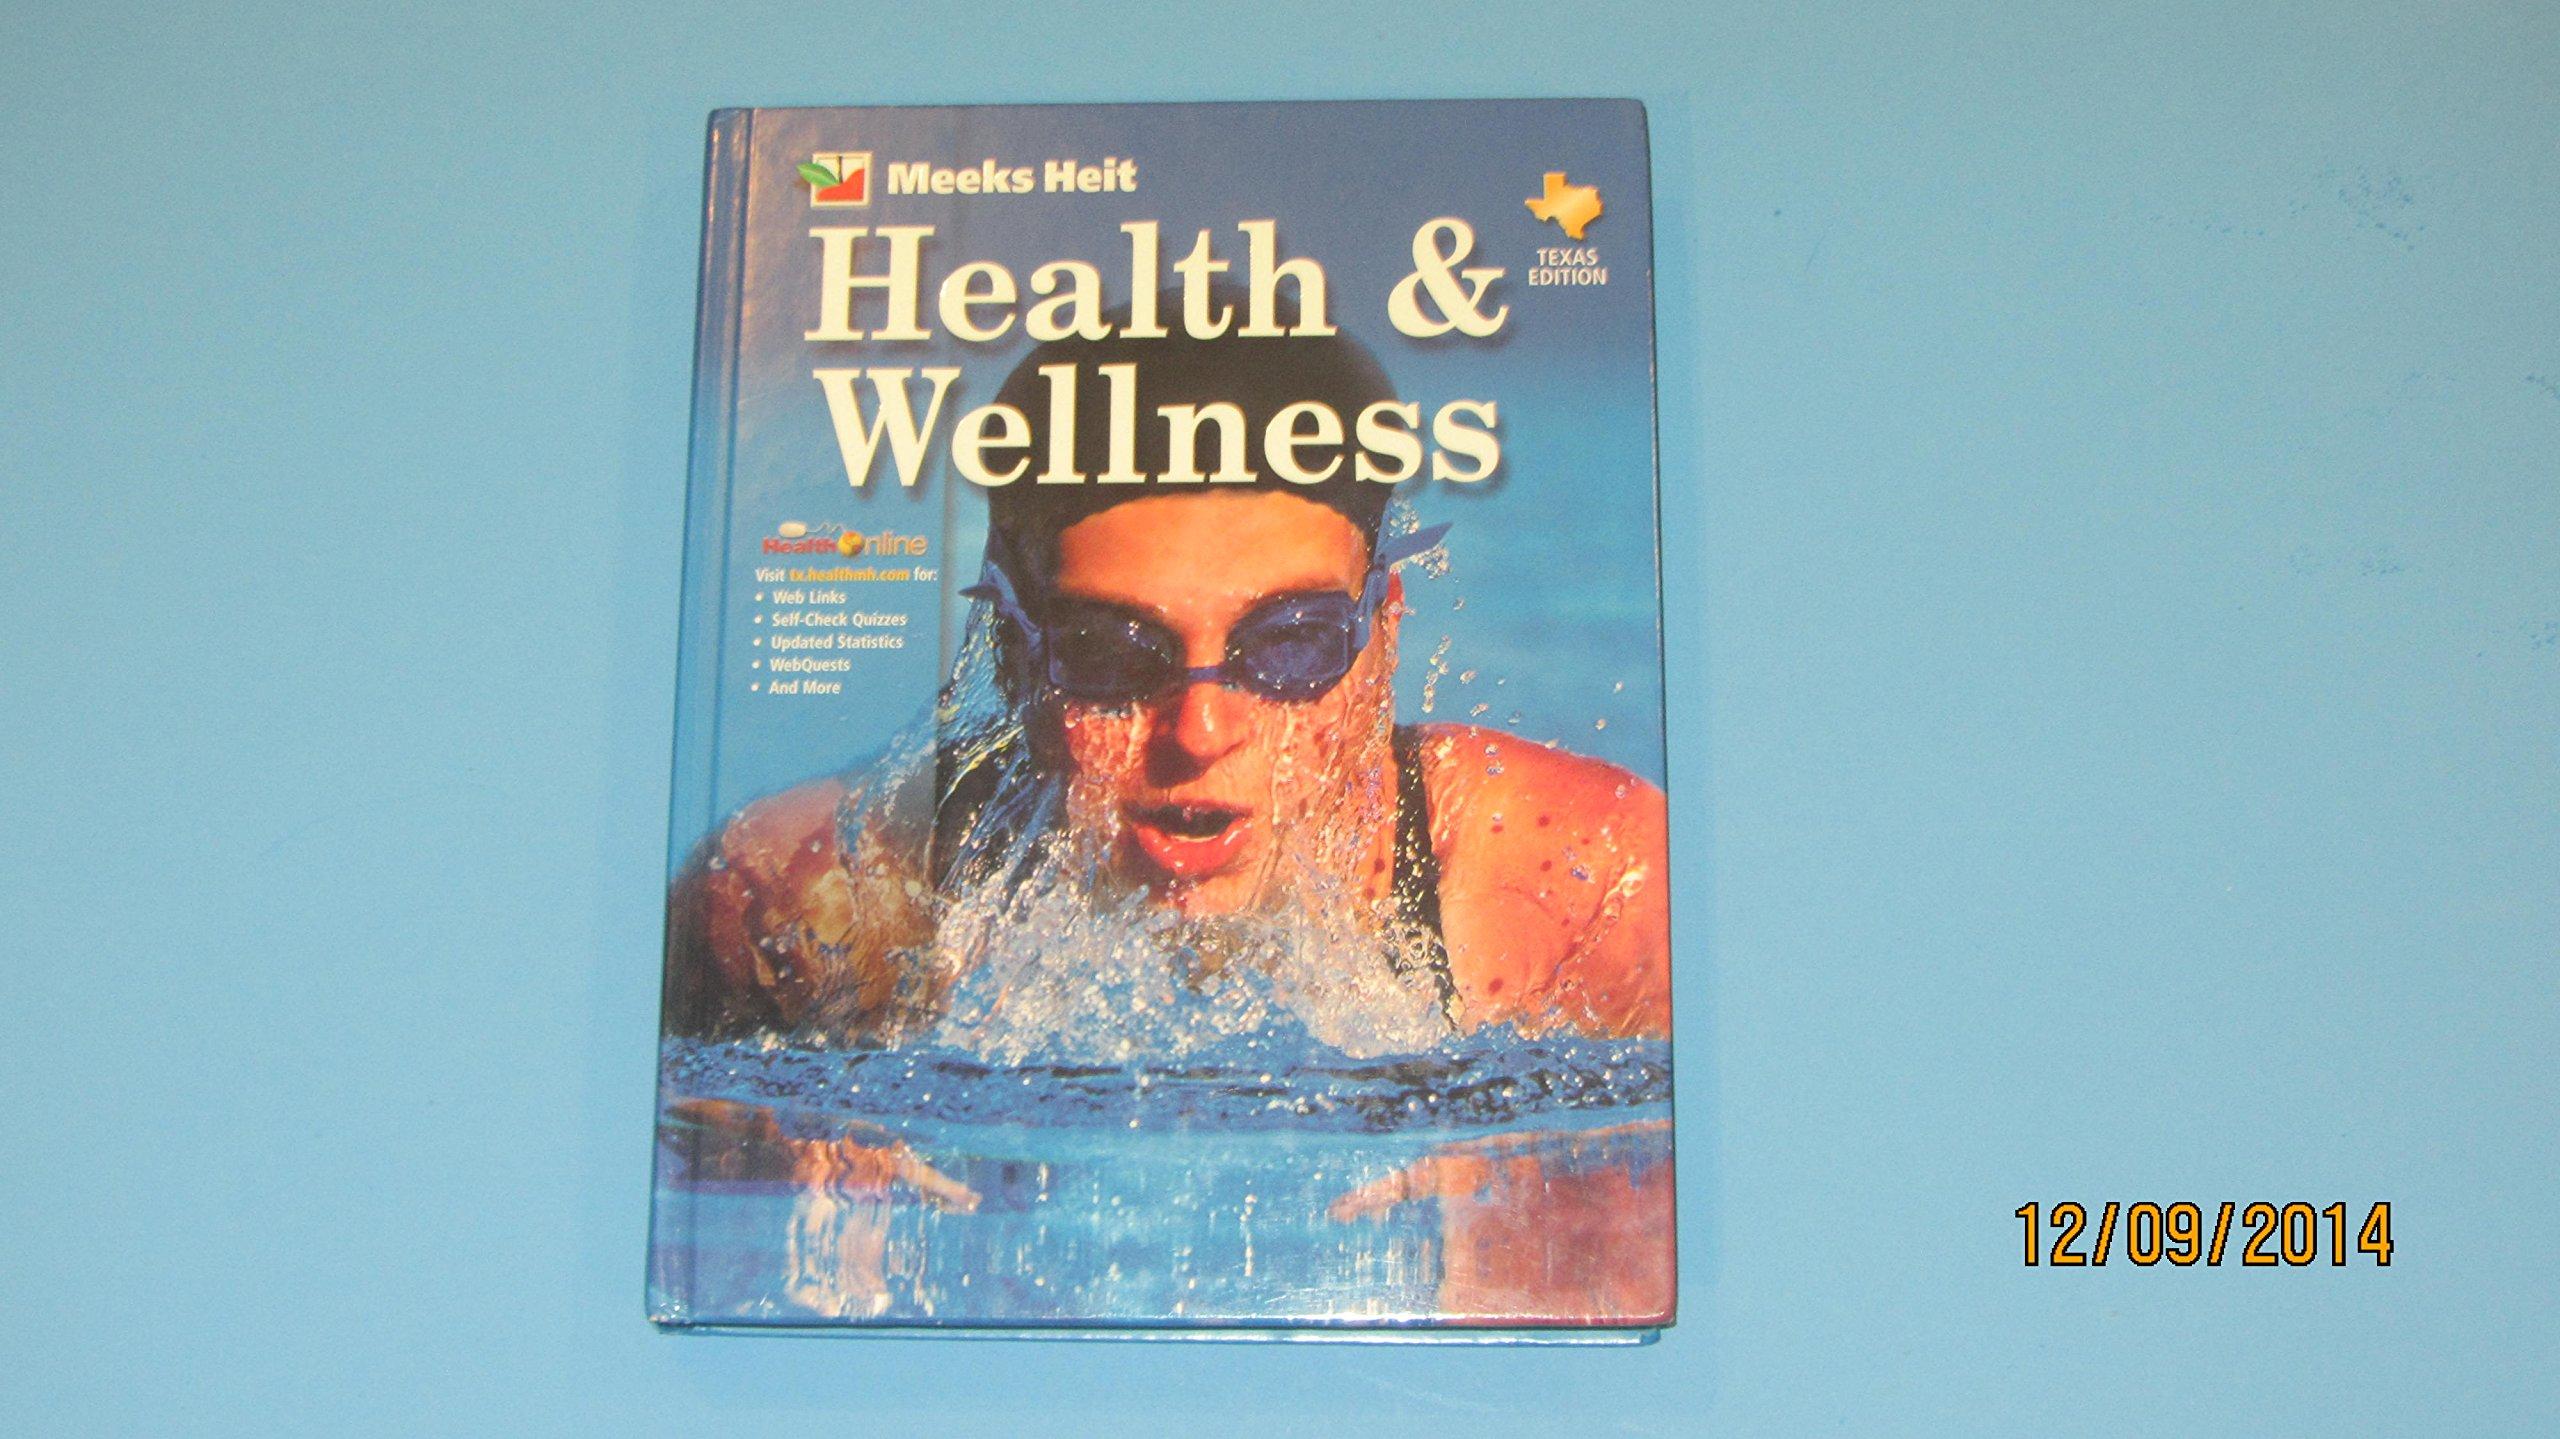 Glencoe health wellness heit page meeks 9780078607684 glencoe health wellness heit page meeks 9780078607684 amazon books fandeluxe Images